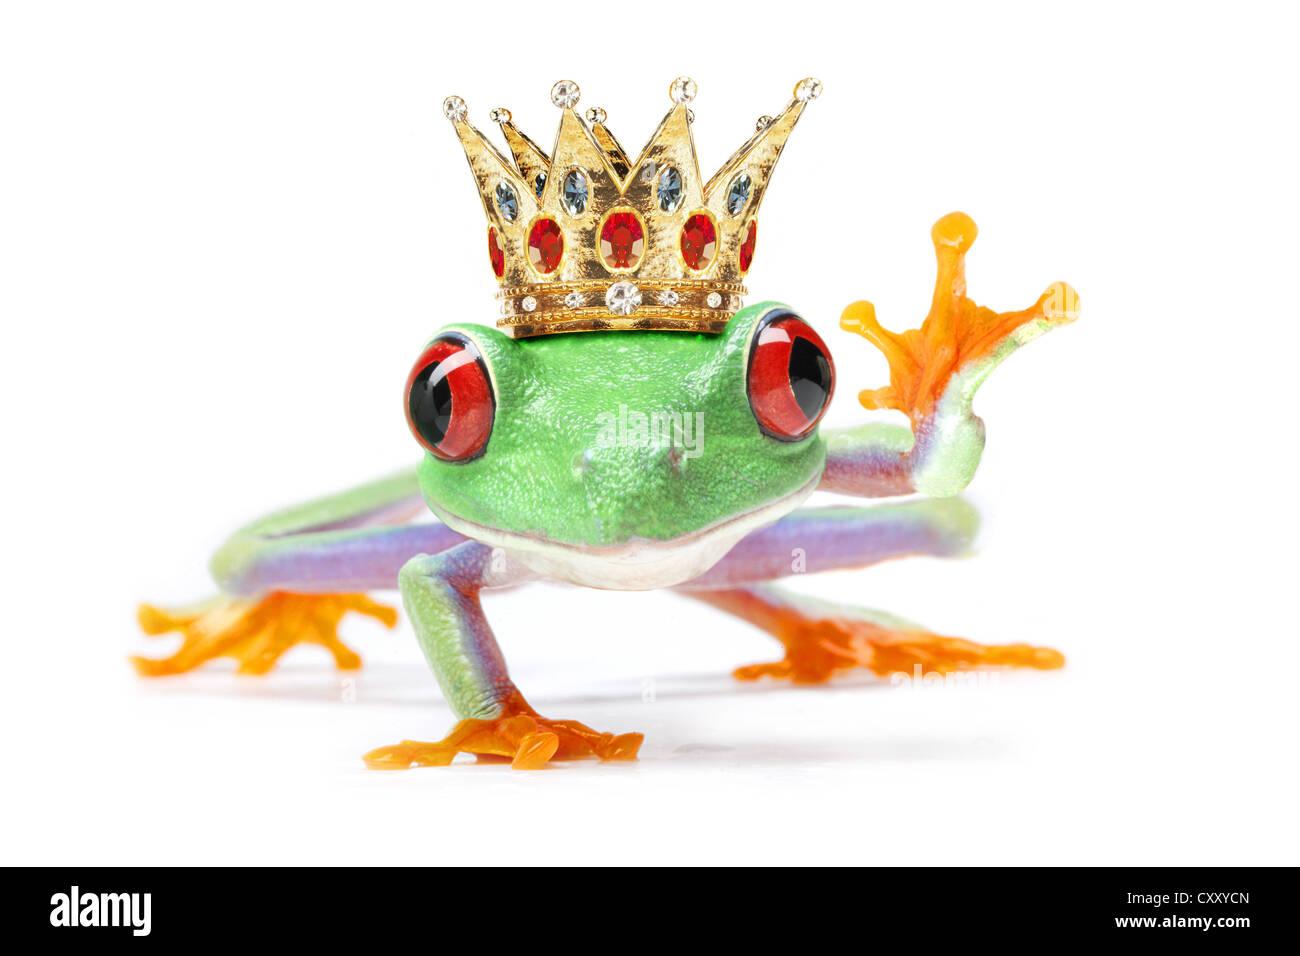 Waving frog wearing a crown Stock Photo